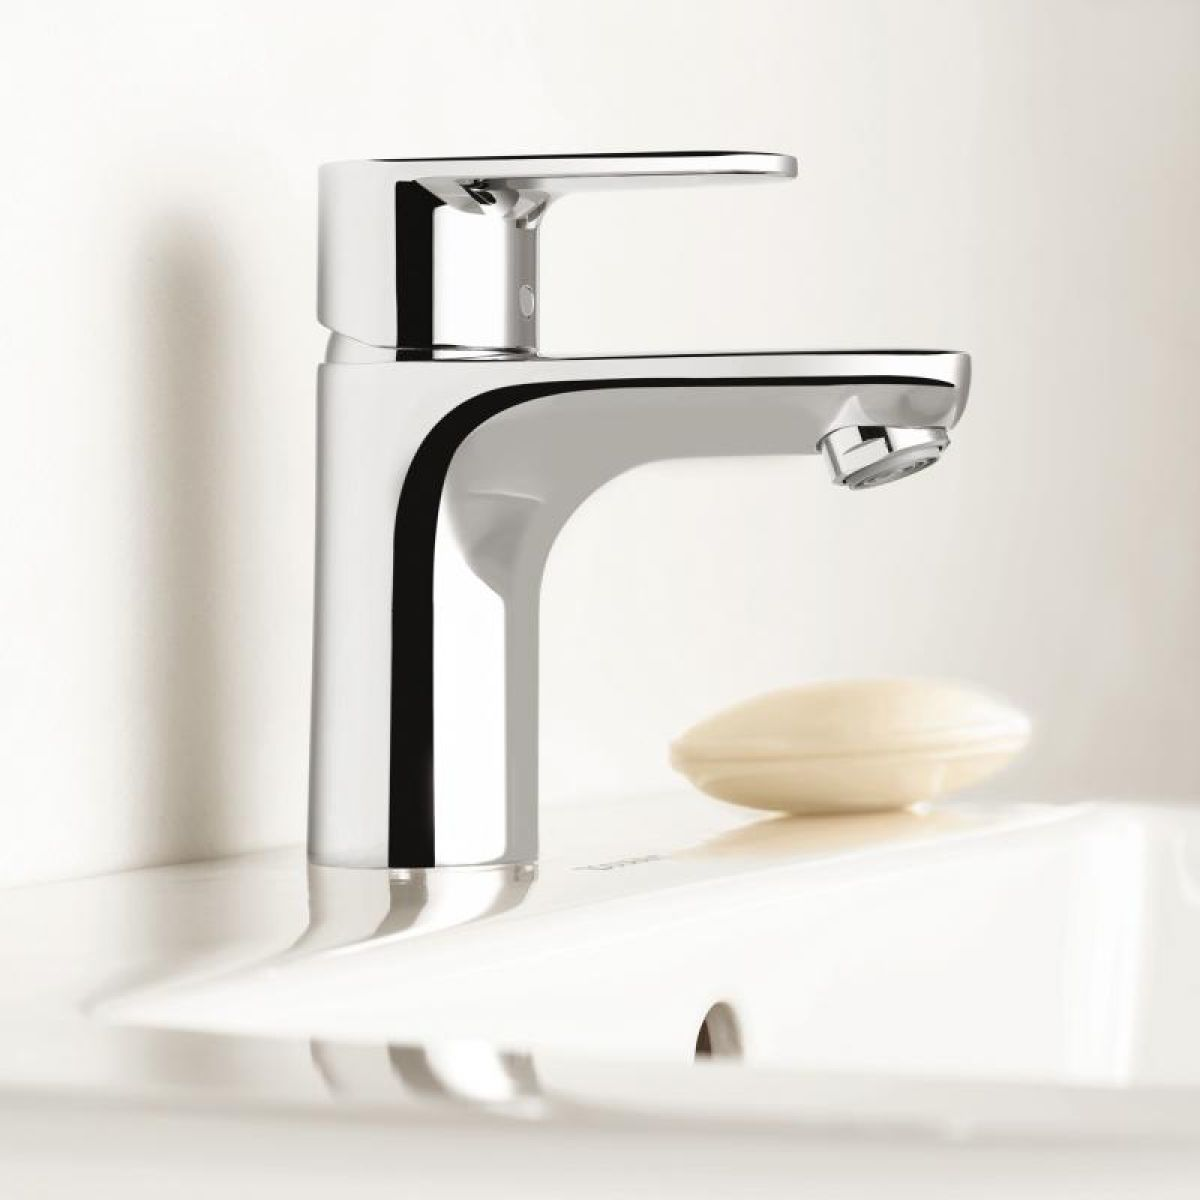 Hansgrohe Talis E 2 Basin Mixer Tap Uk Bathrooms